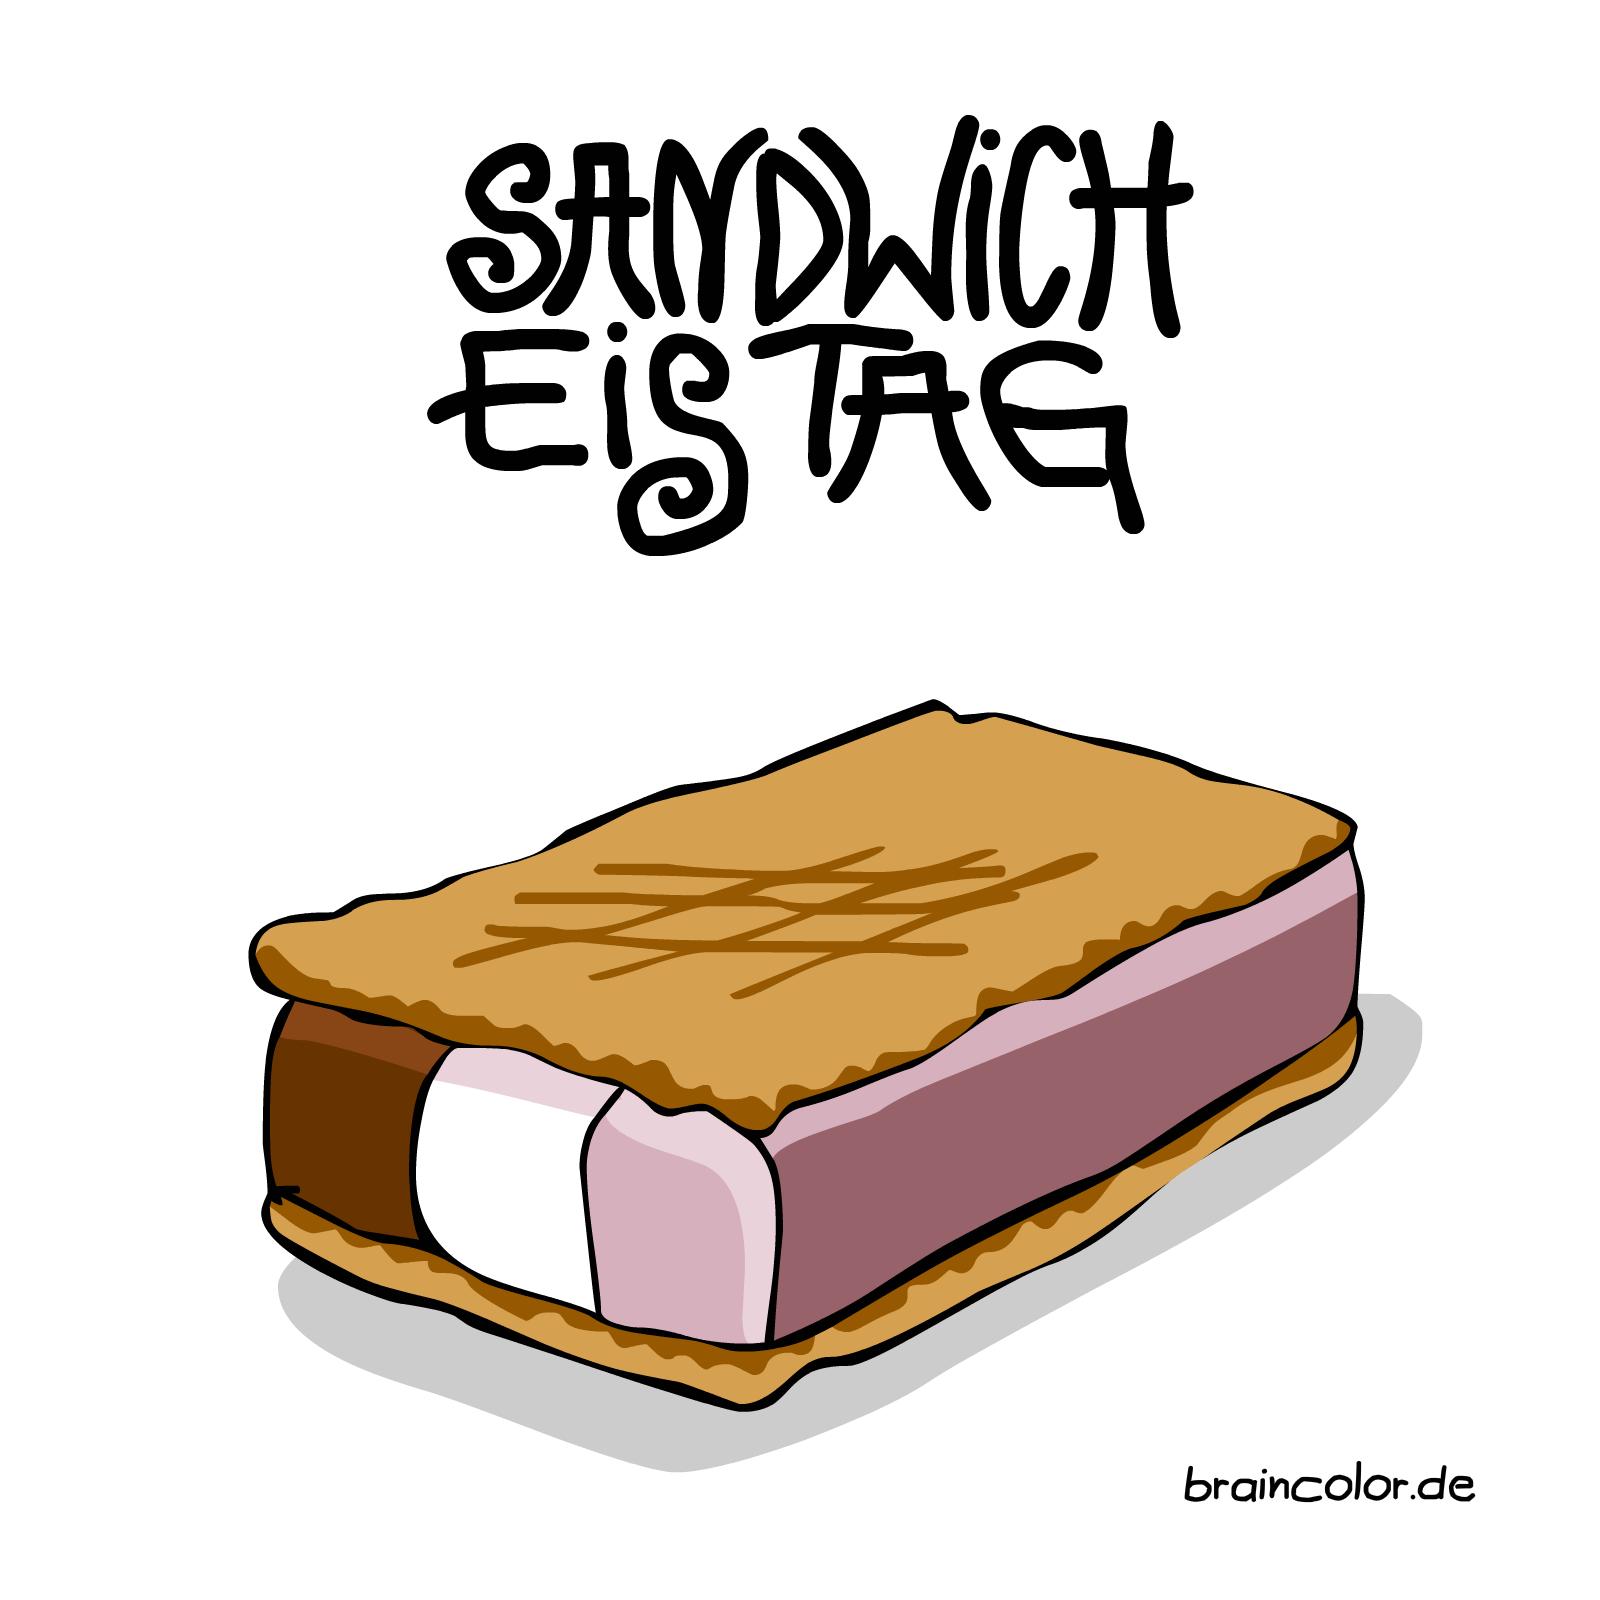 Sandwich-Eis-Tag